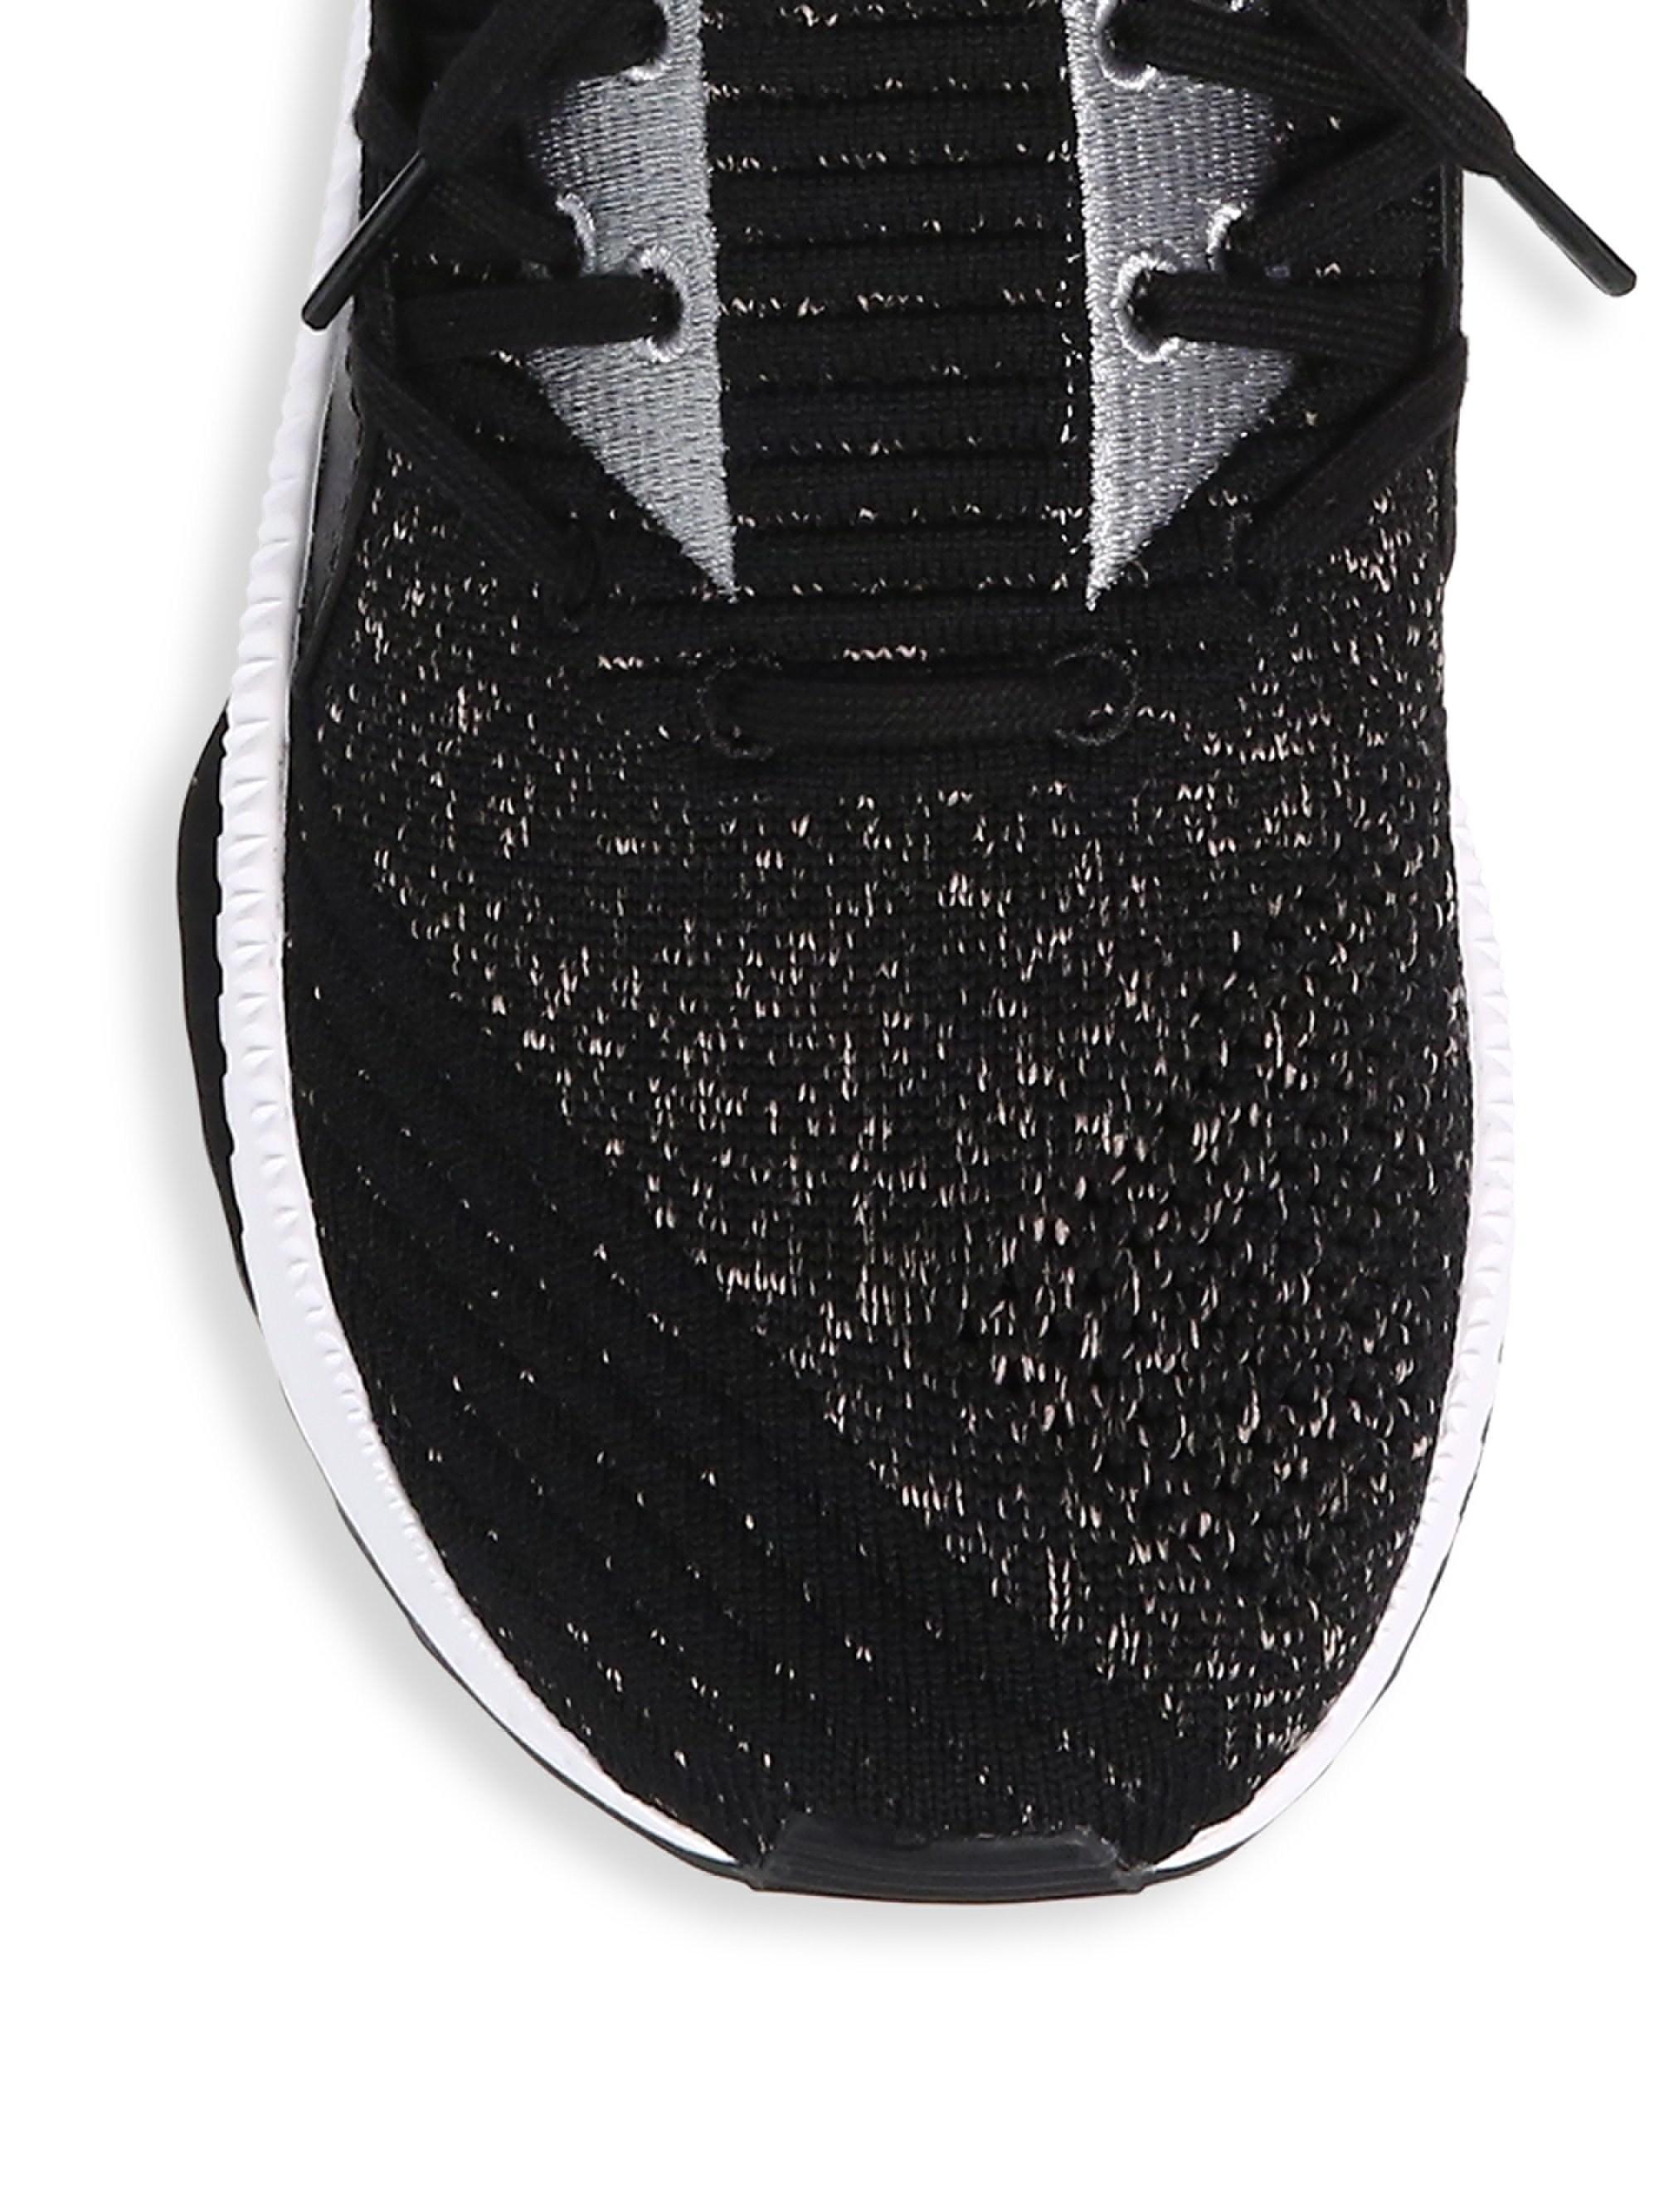 Lyst - PUMA Women s Tsugi Shinsei Knit Fabric Running Sneakers - Black -  Size 38 (7.5) in Black dabf16313